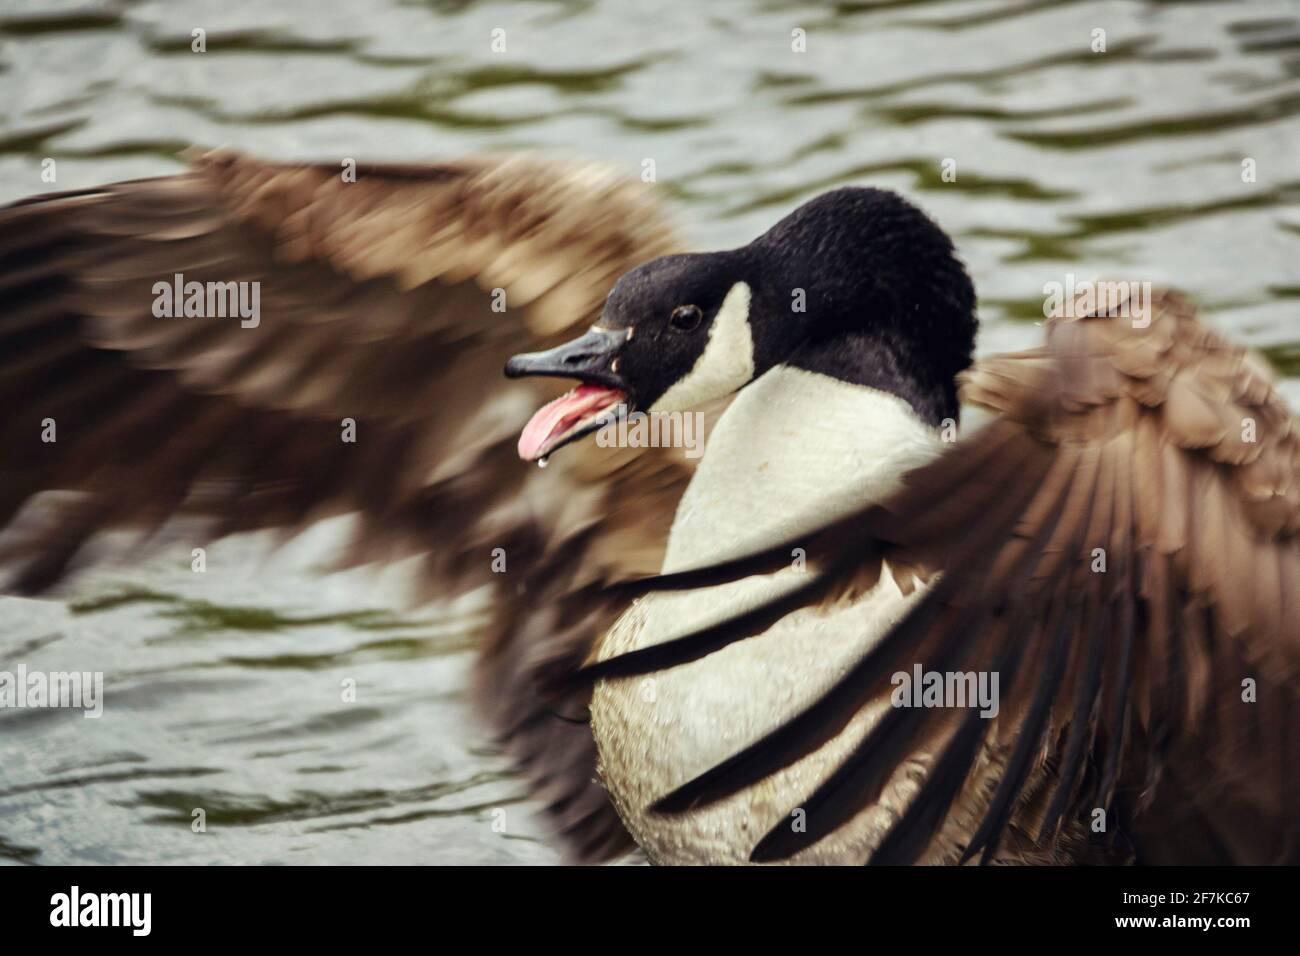 canada-goose-branta-canadensis-standing-